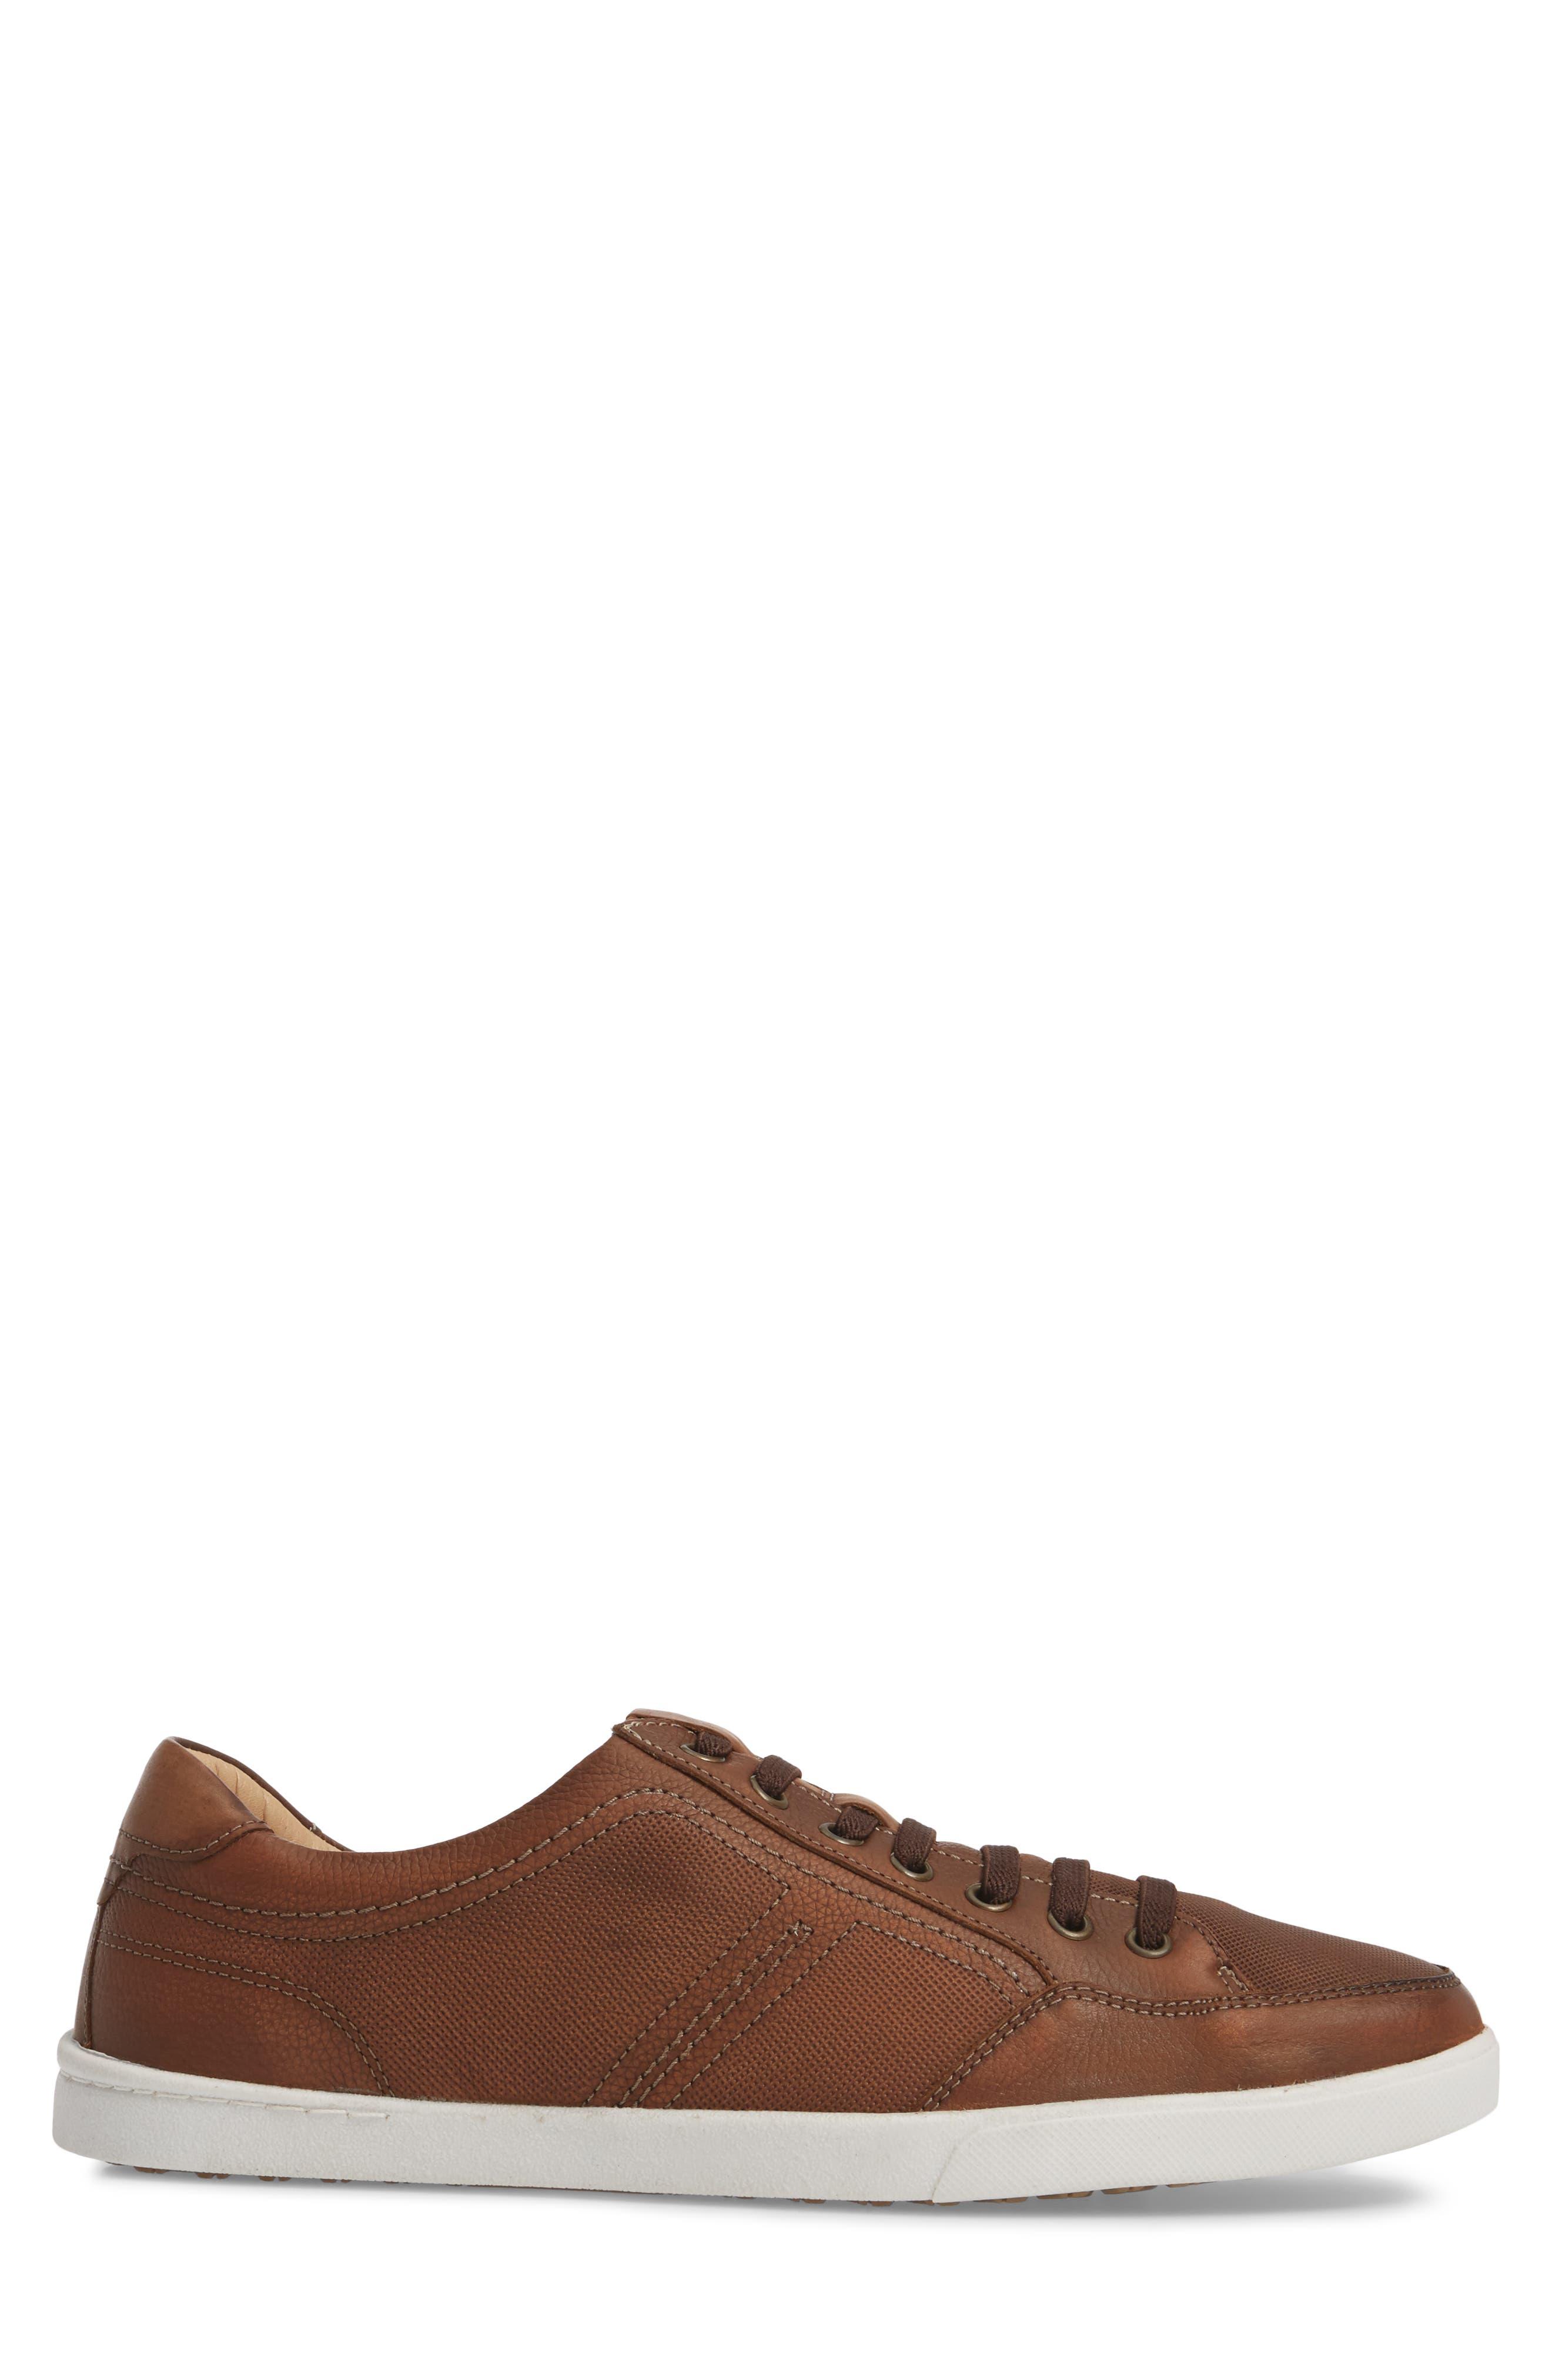 Quinton Textured Low Top Sneaker,                             Alternate thumbnail 3, color,                             Tan Leather